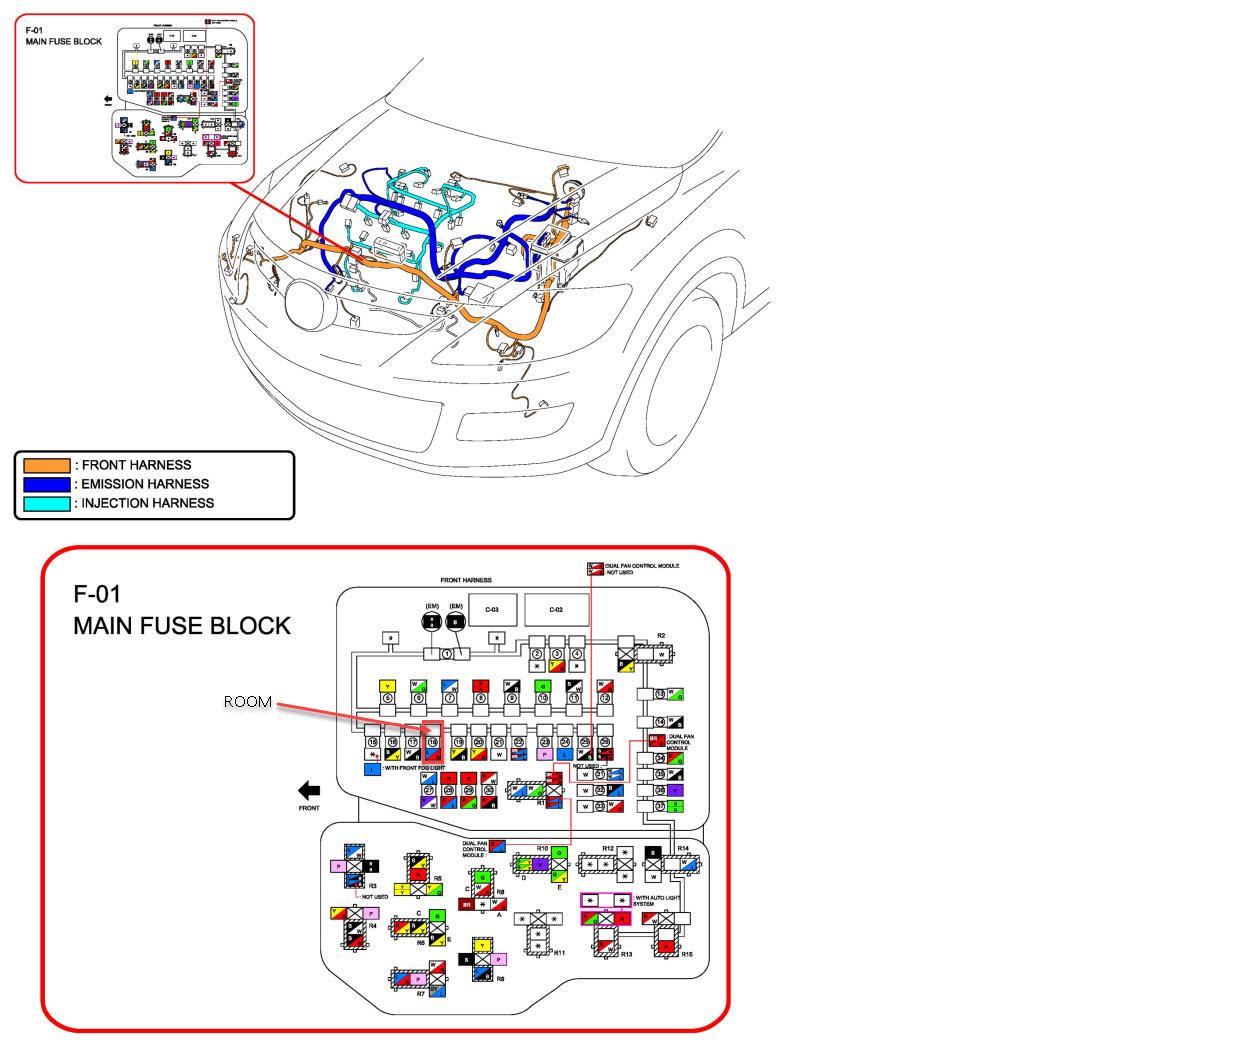 11a9908a-cbe5-4a29-b6db-7e7b5e292088_2011 Mazda CX9 Room Lamp fuse.jpg